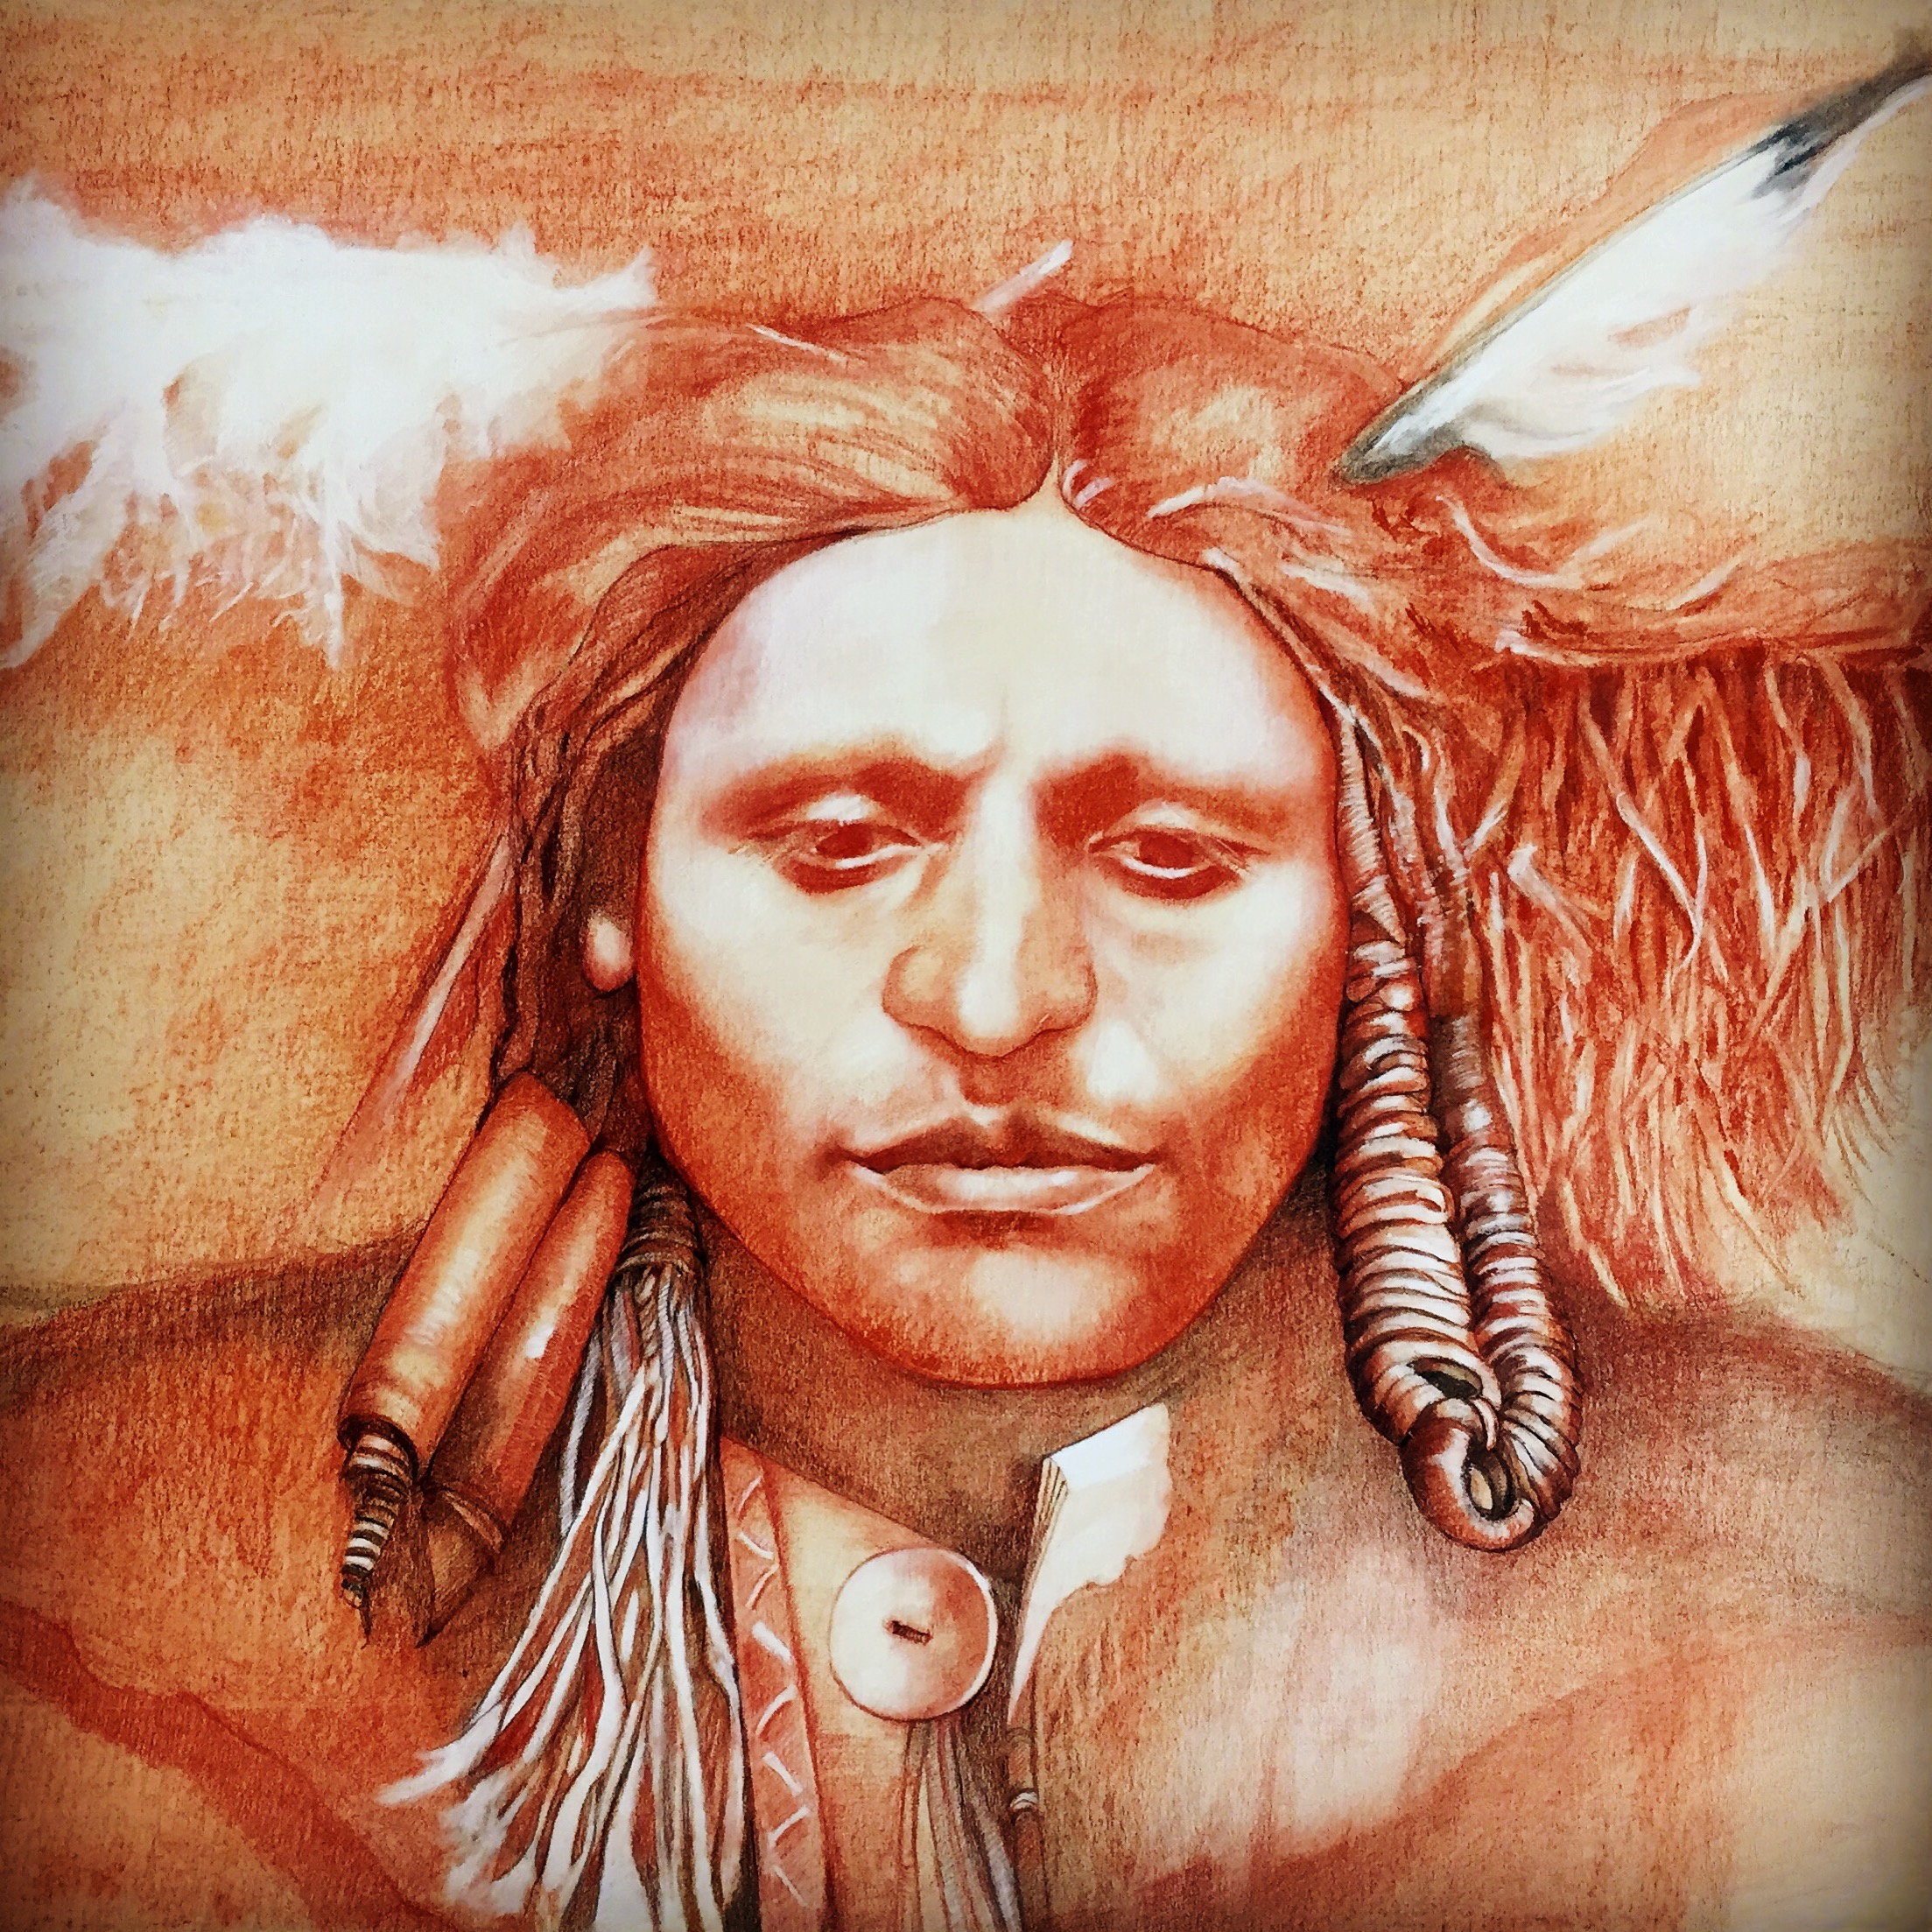 Iroquois Indian. 2016.